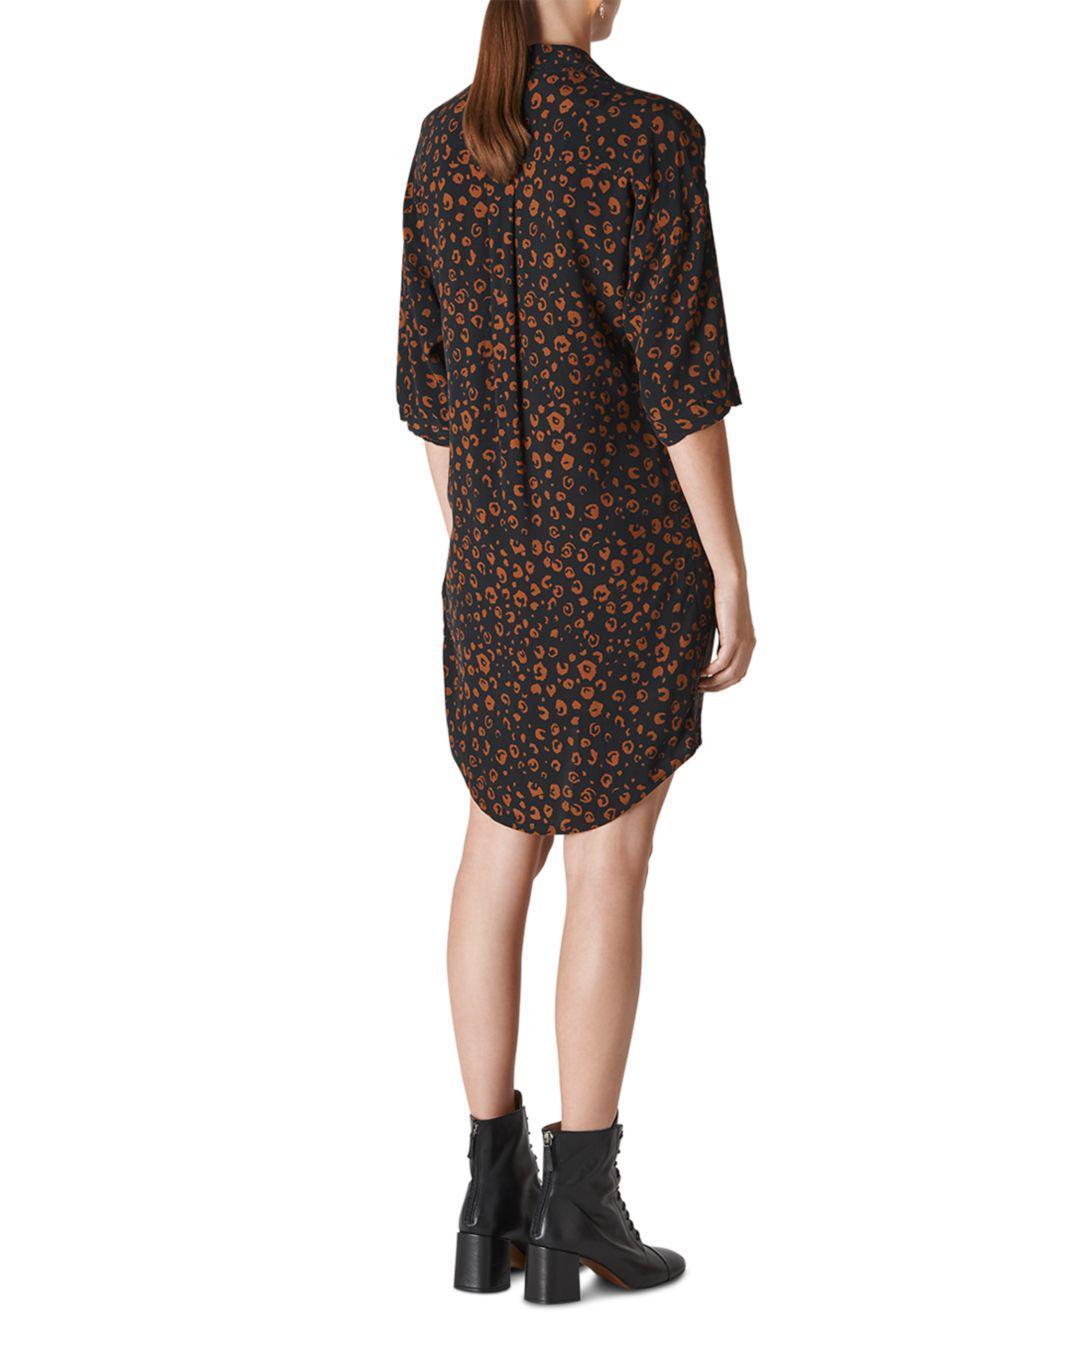 Lyst - Whistles Lola Cheetah-print Dress in Black 74eb4b9db